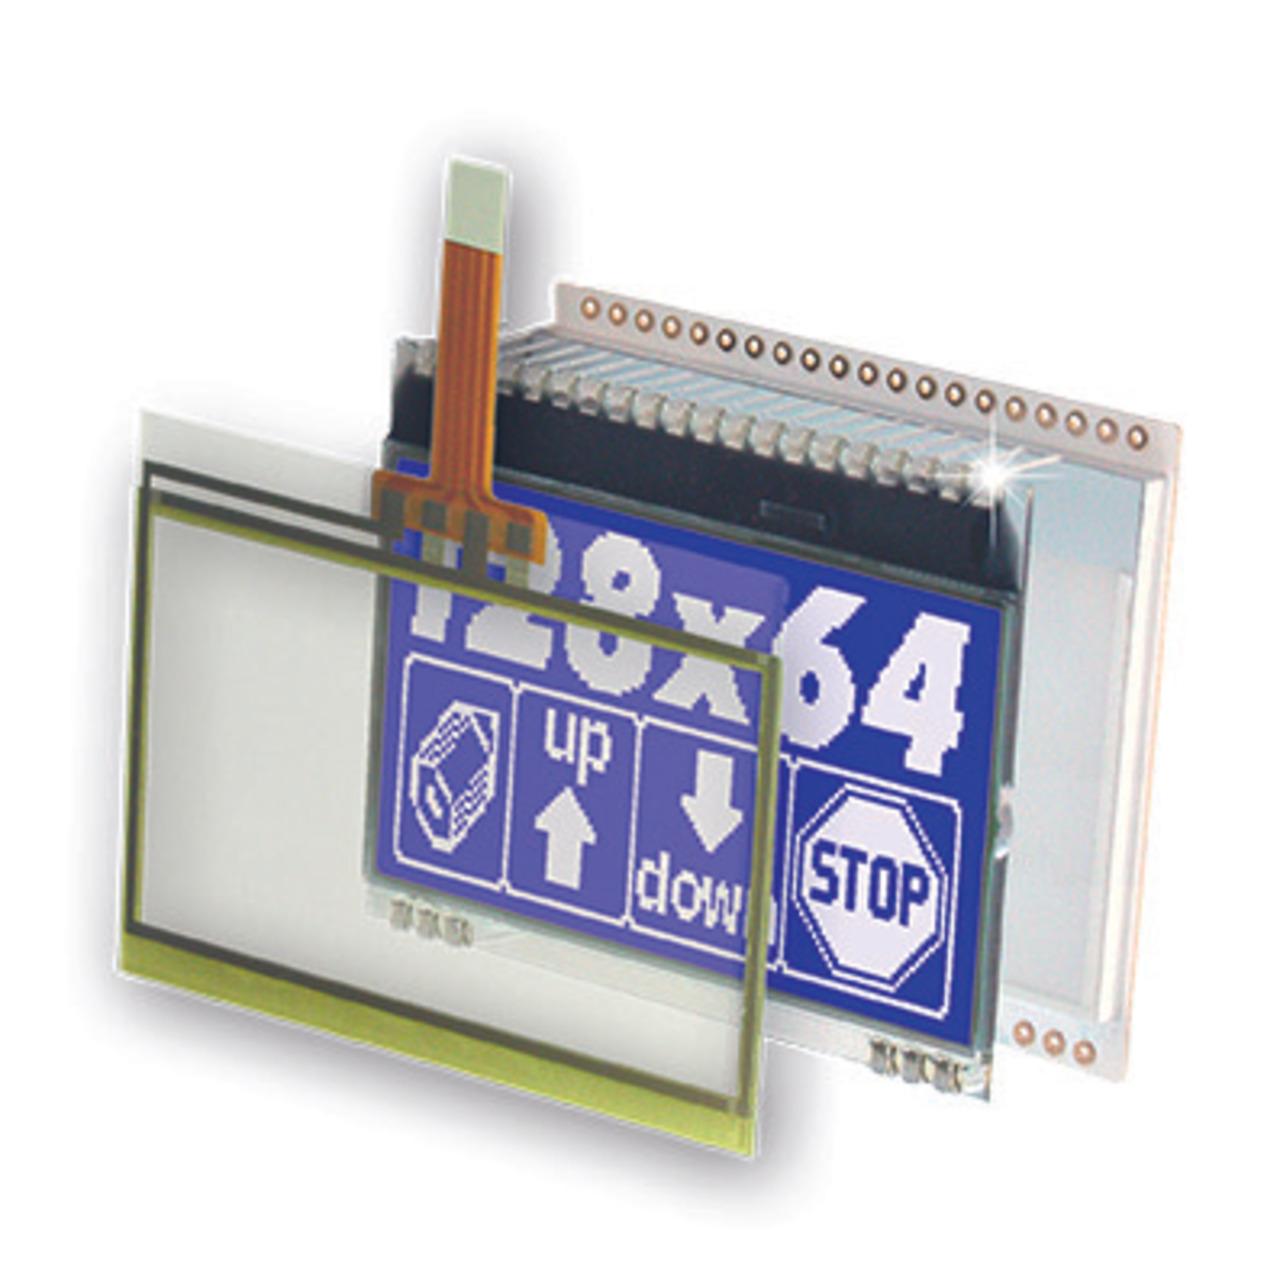 Electronic Assembly LCD-Grafikdisplay EA DOGM128 128x64 Pixel- STN blau